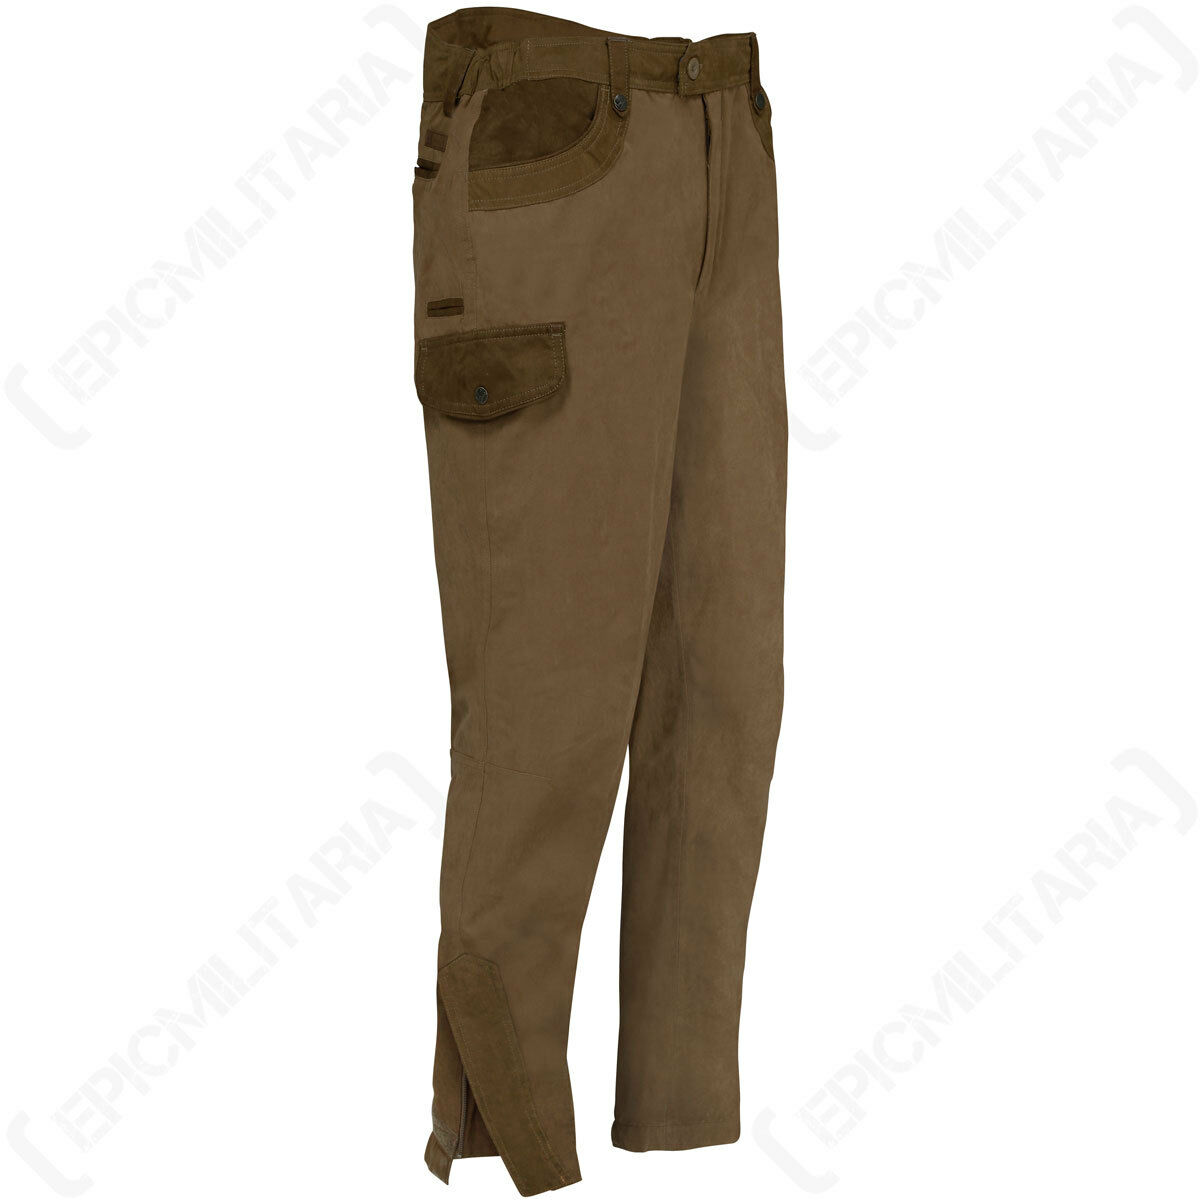 Rambouillet caza pantalones-latón-disparar pescar impermeable señores pantalones